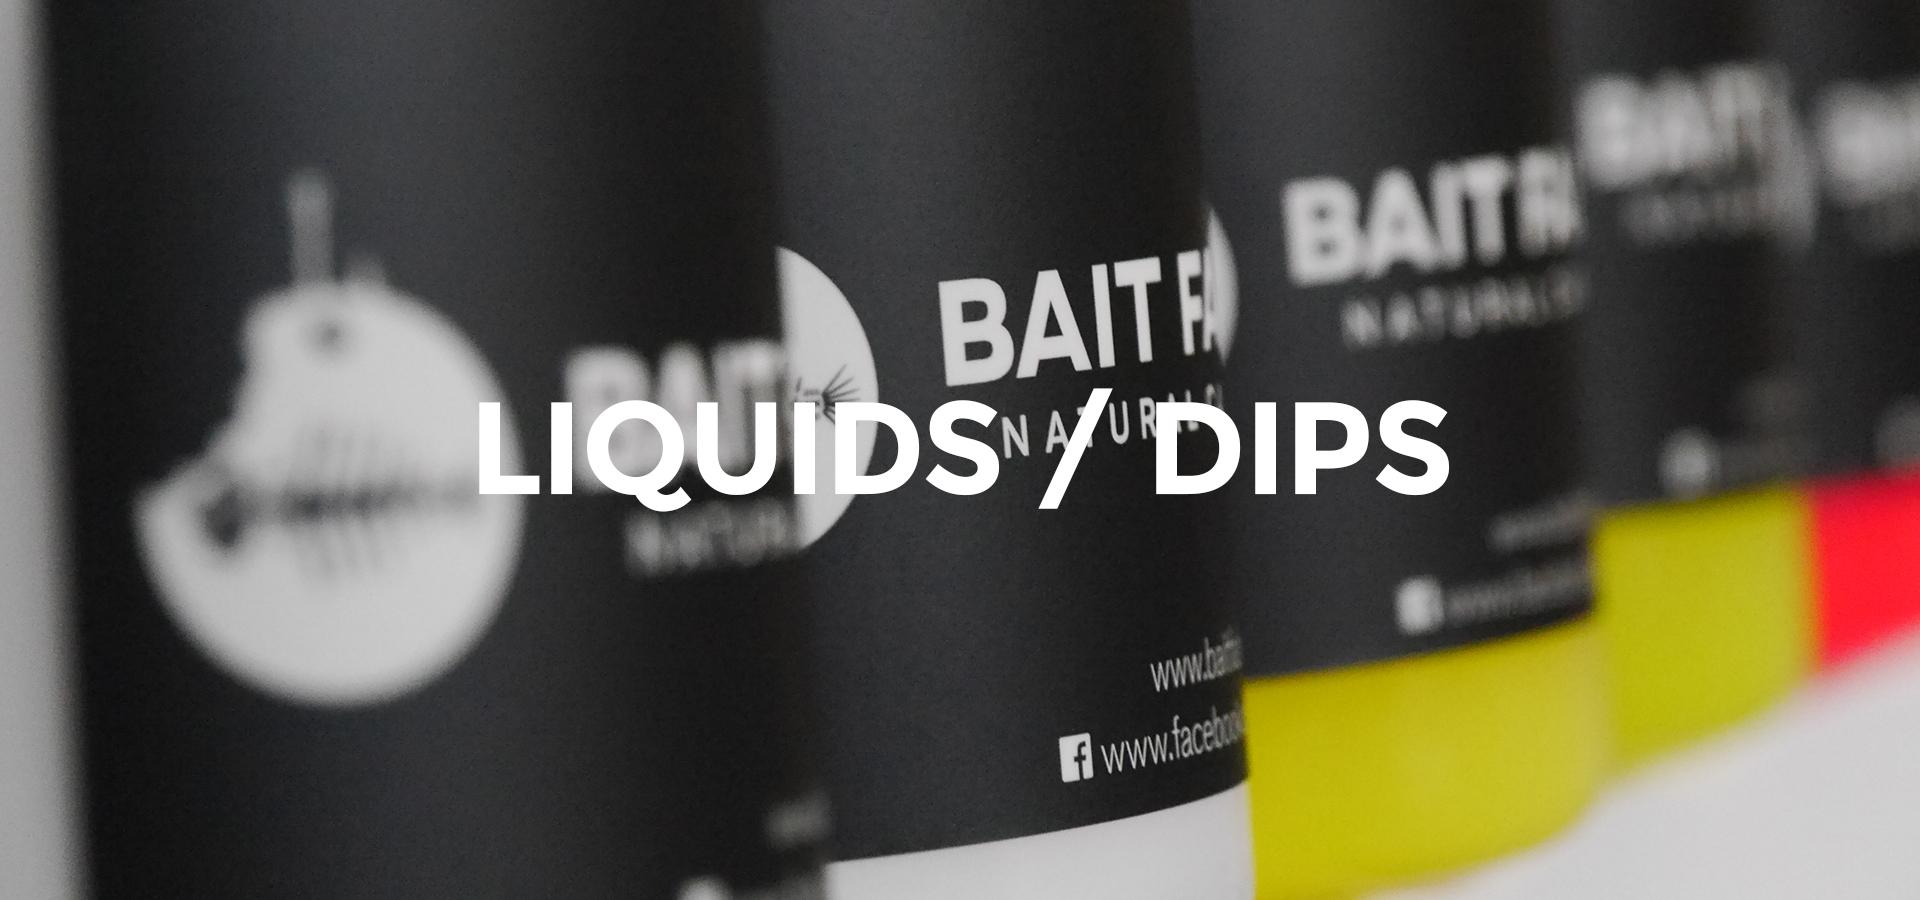 Liquids / Dips